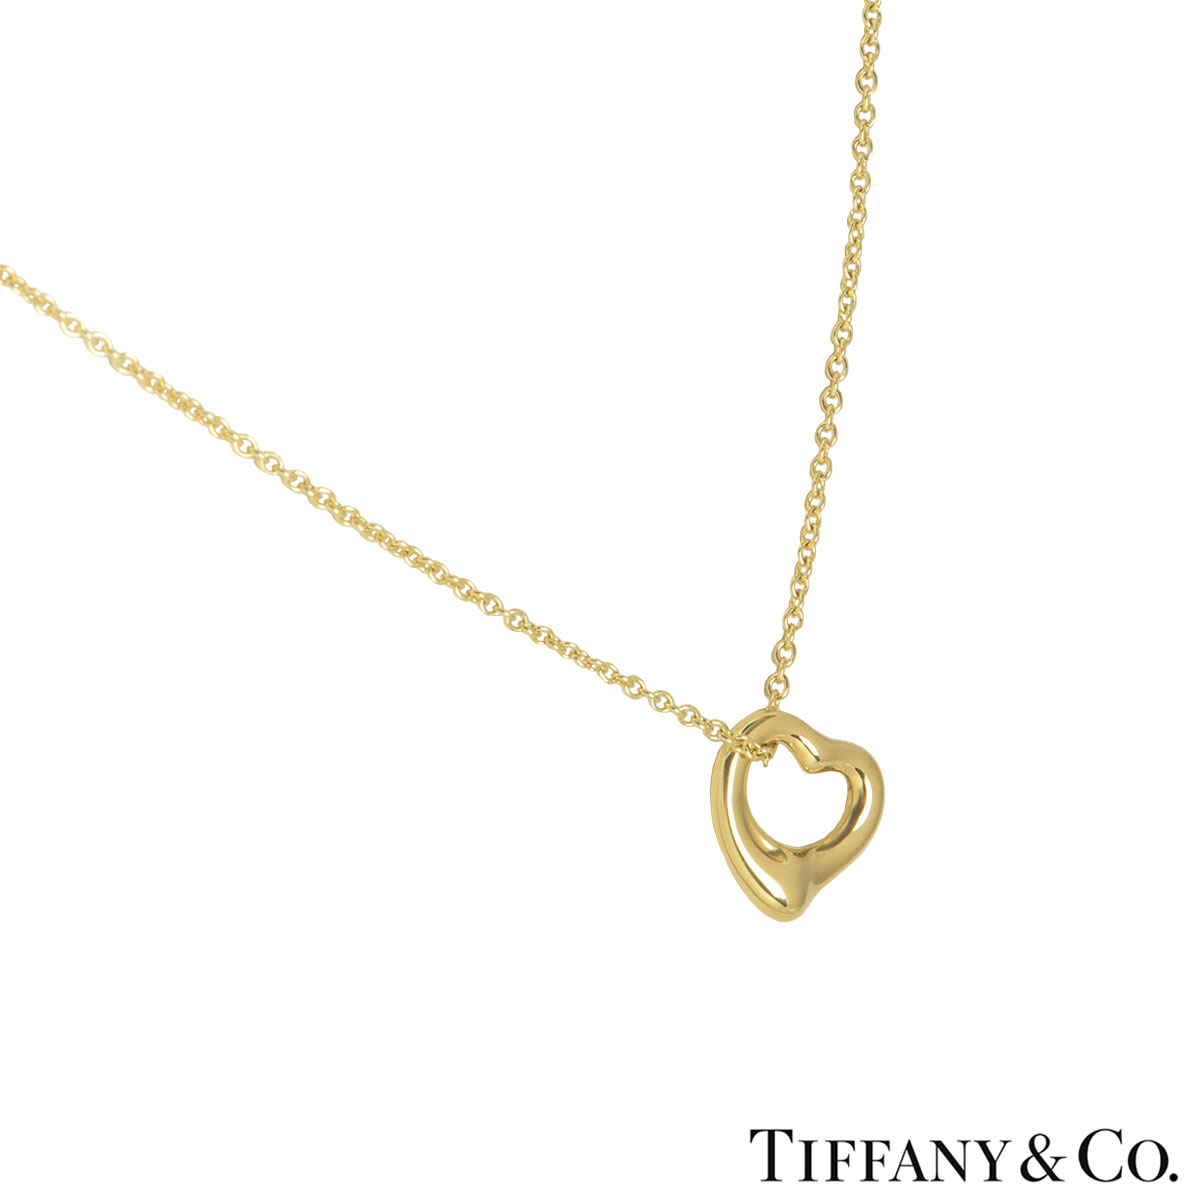 Tiffany & Co. Yellow Gold Elsa Peretti Necklace